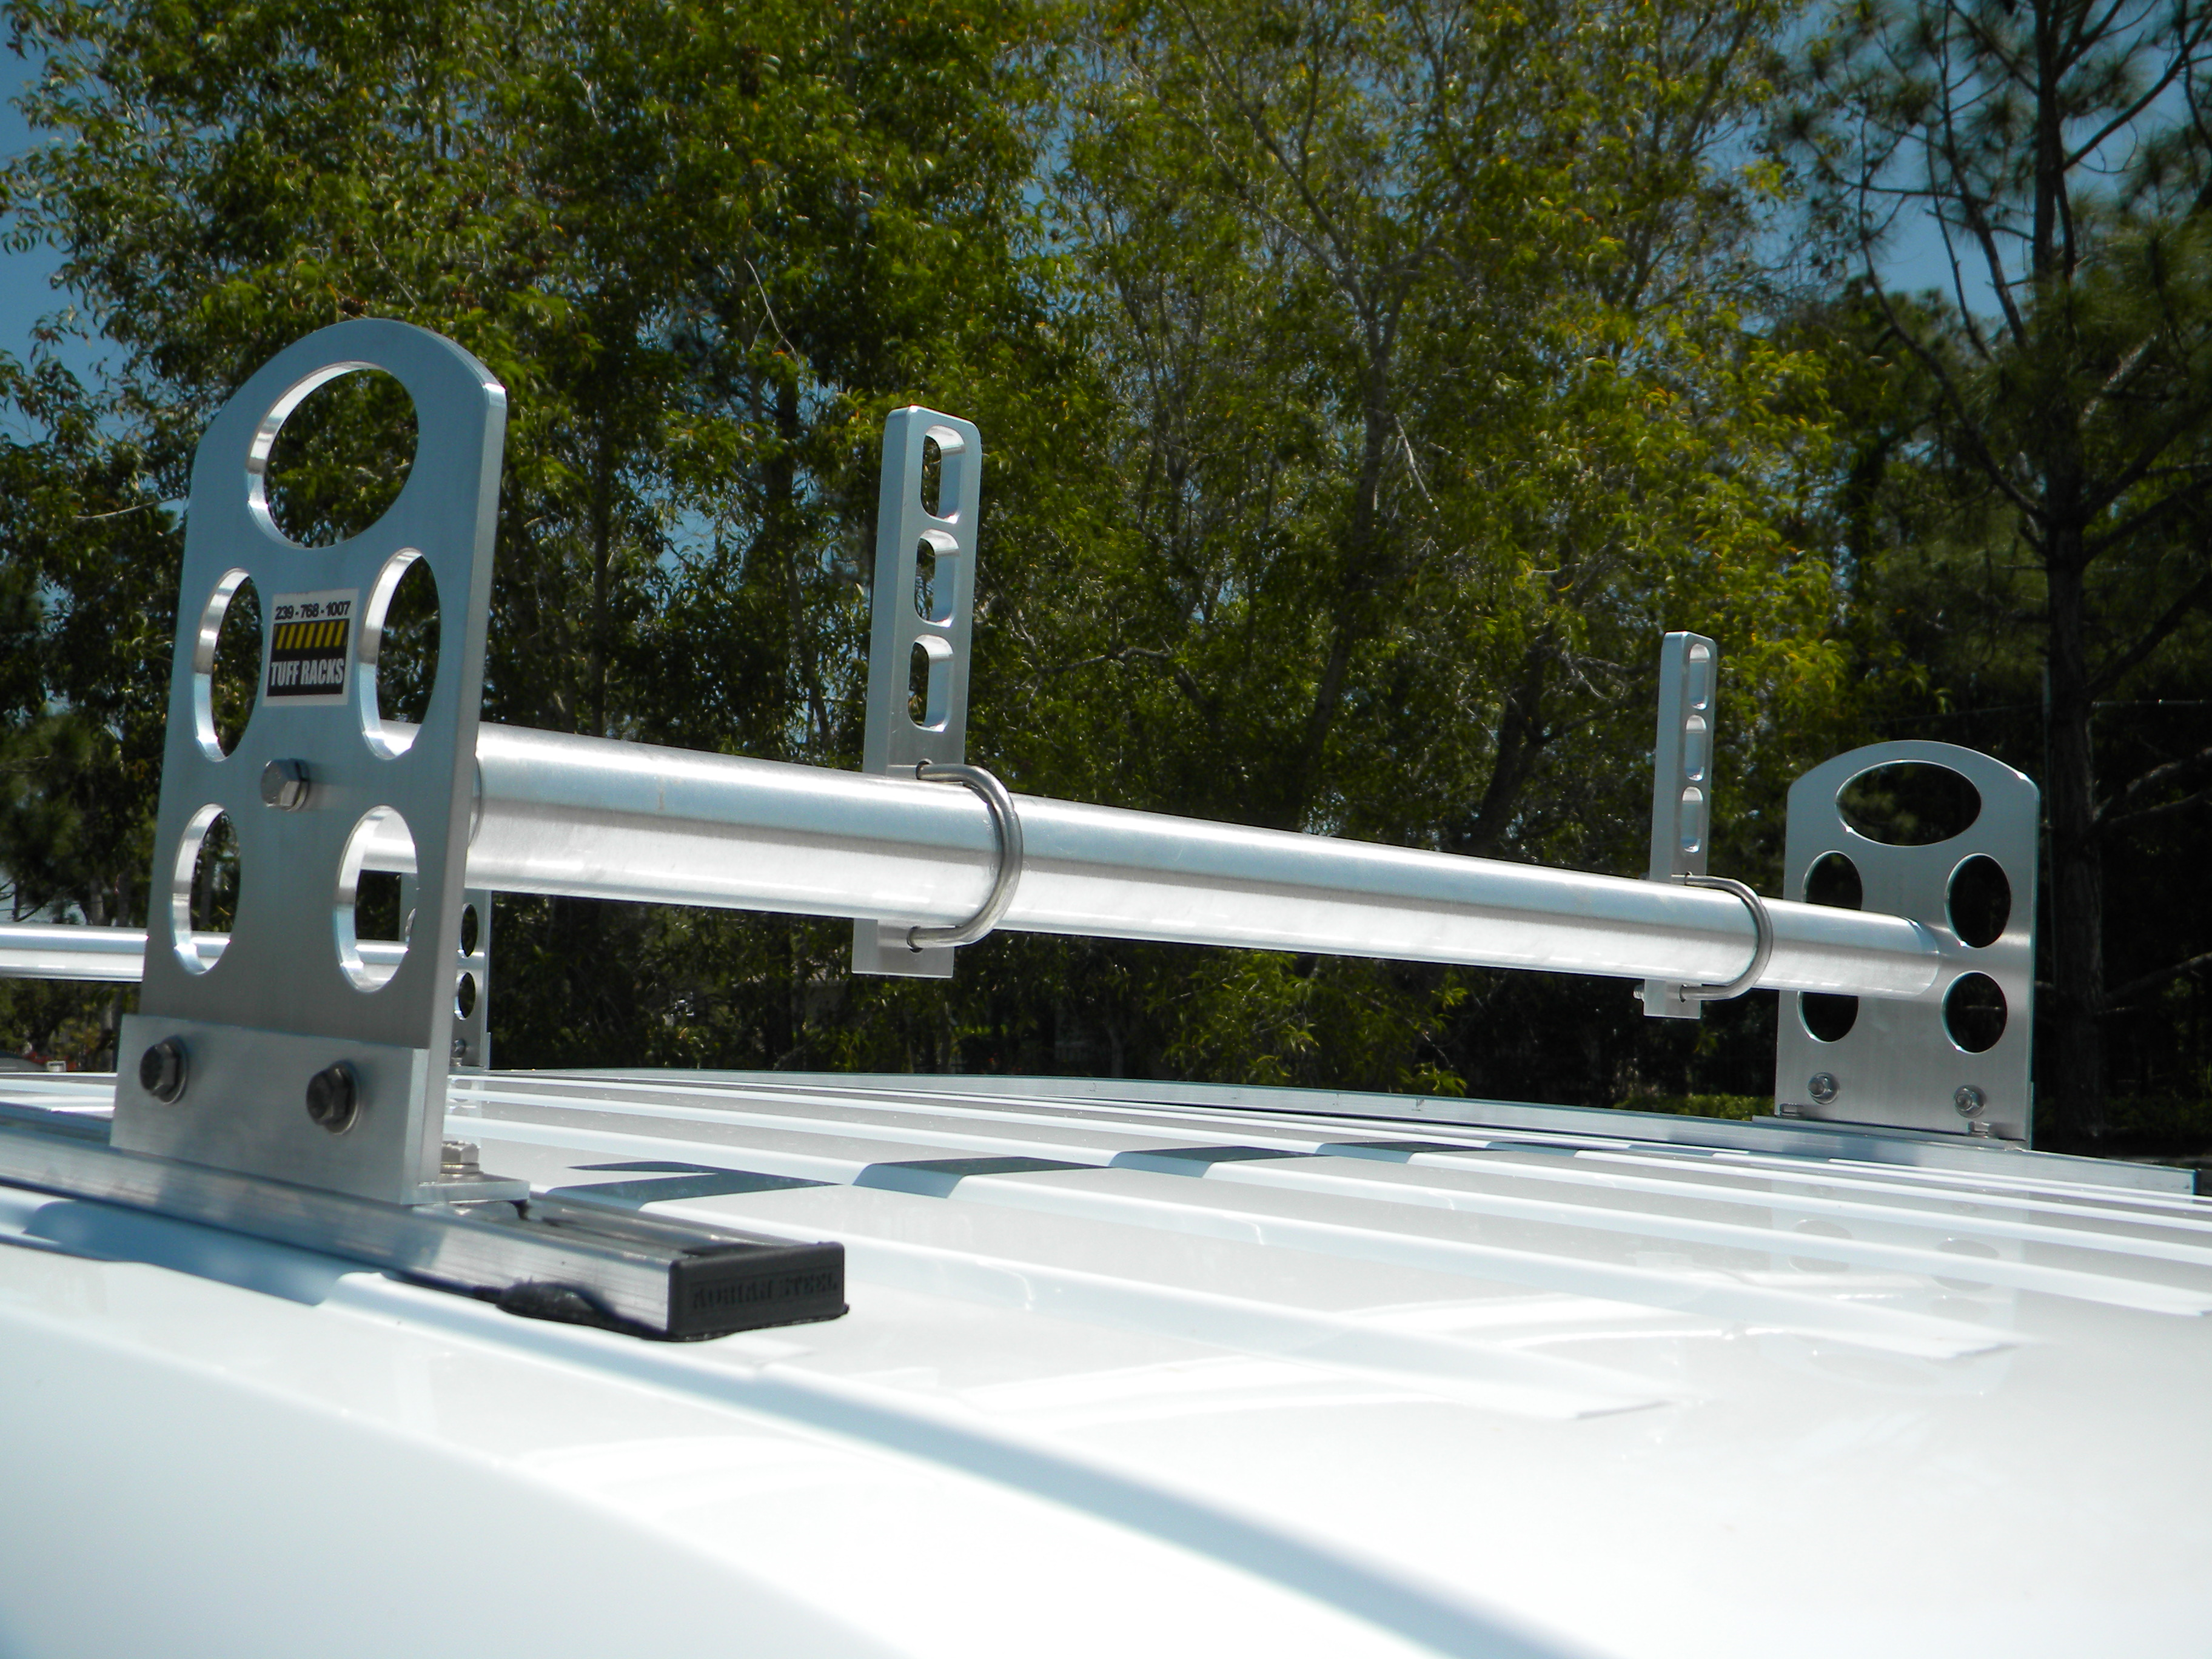 Ford Transit Connect Ladder Racks Tuff Racks